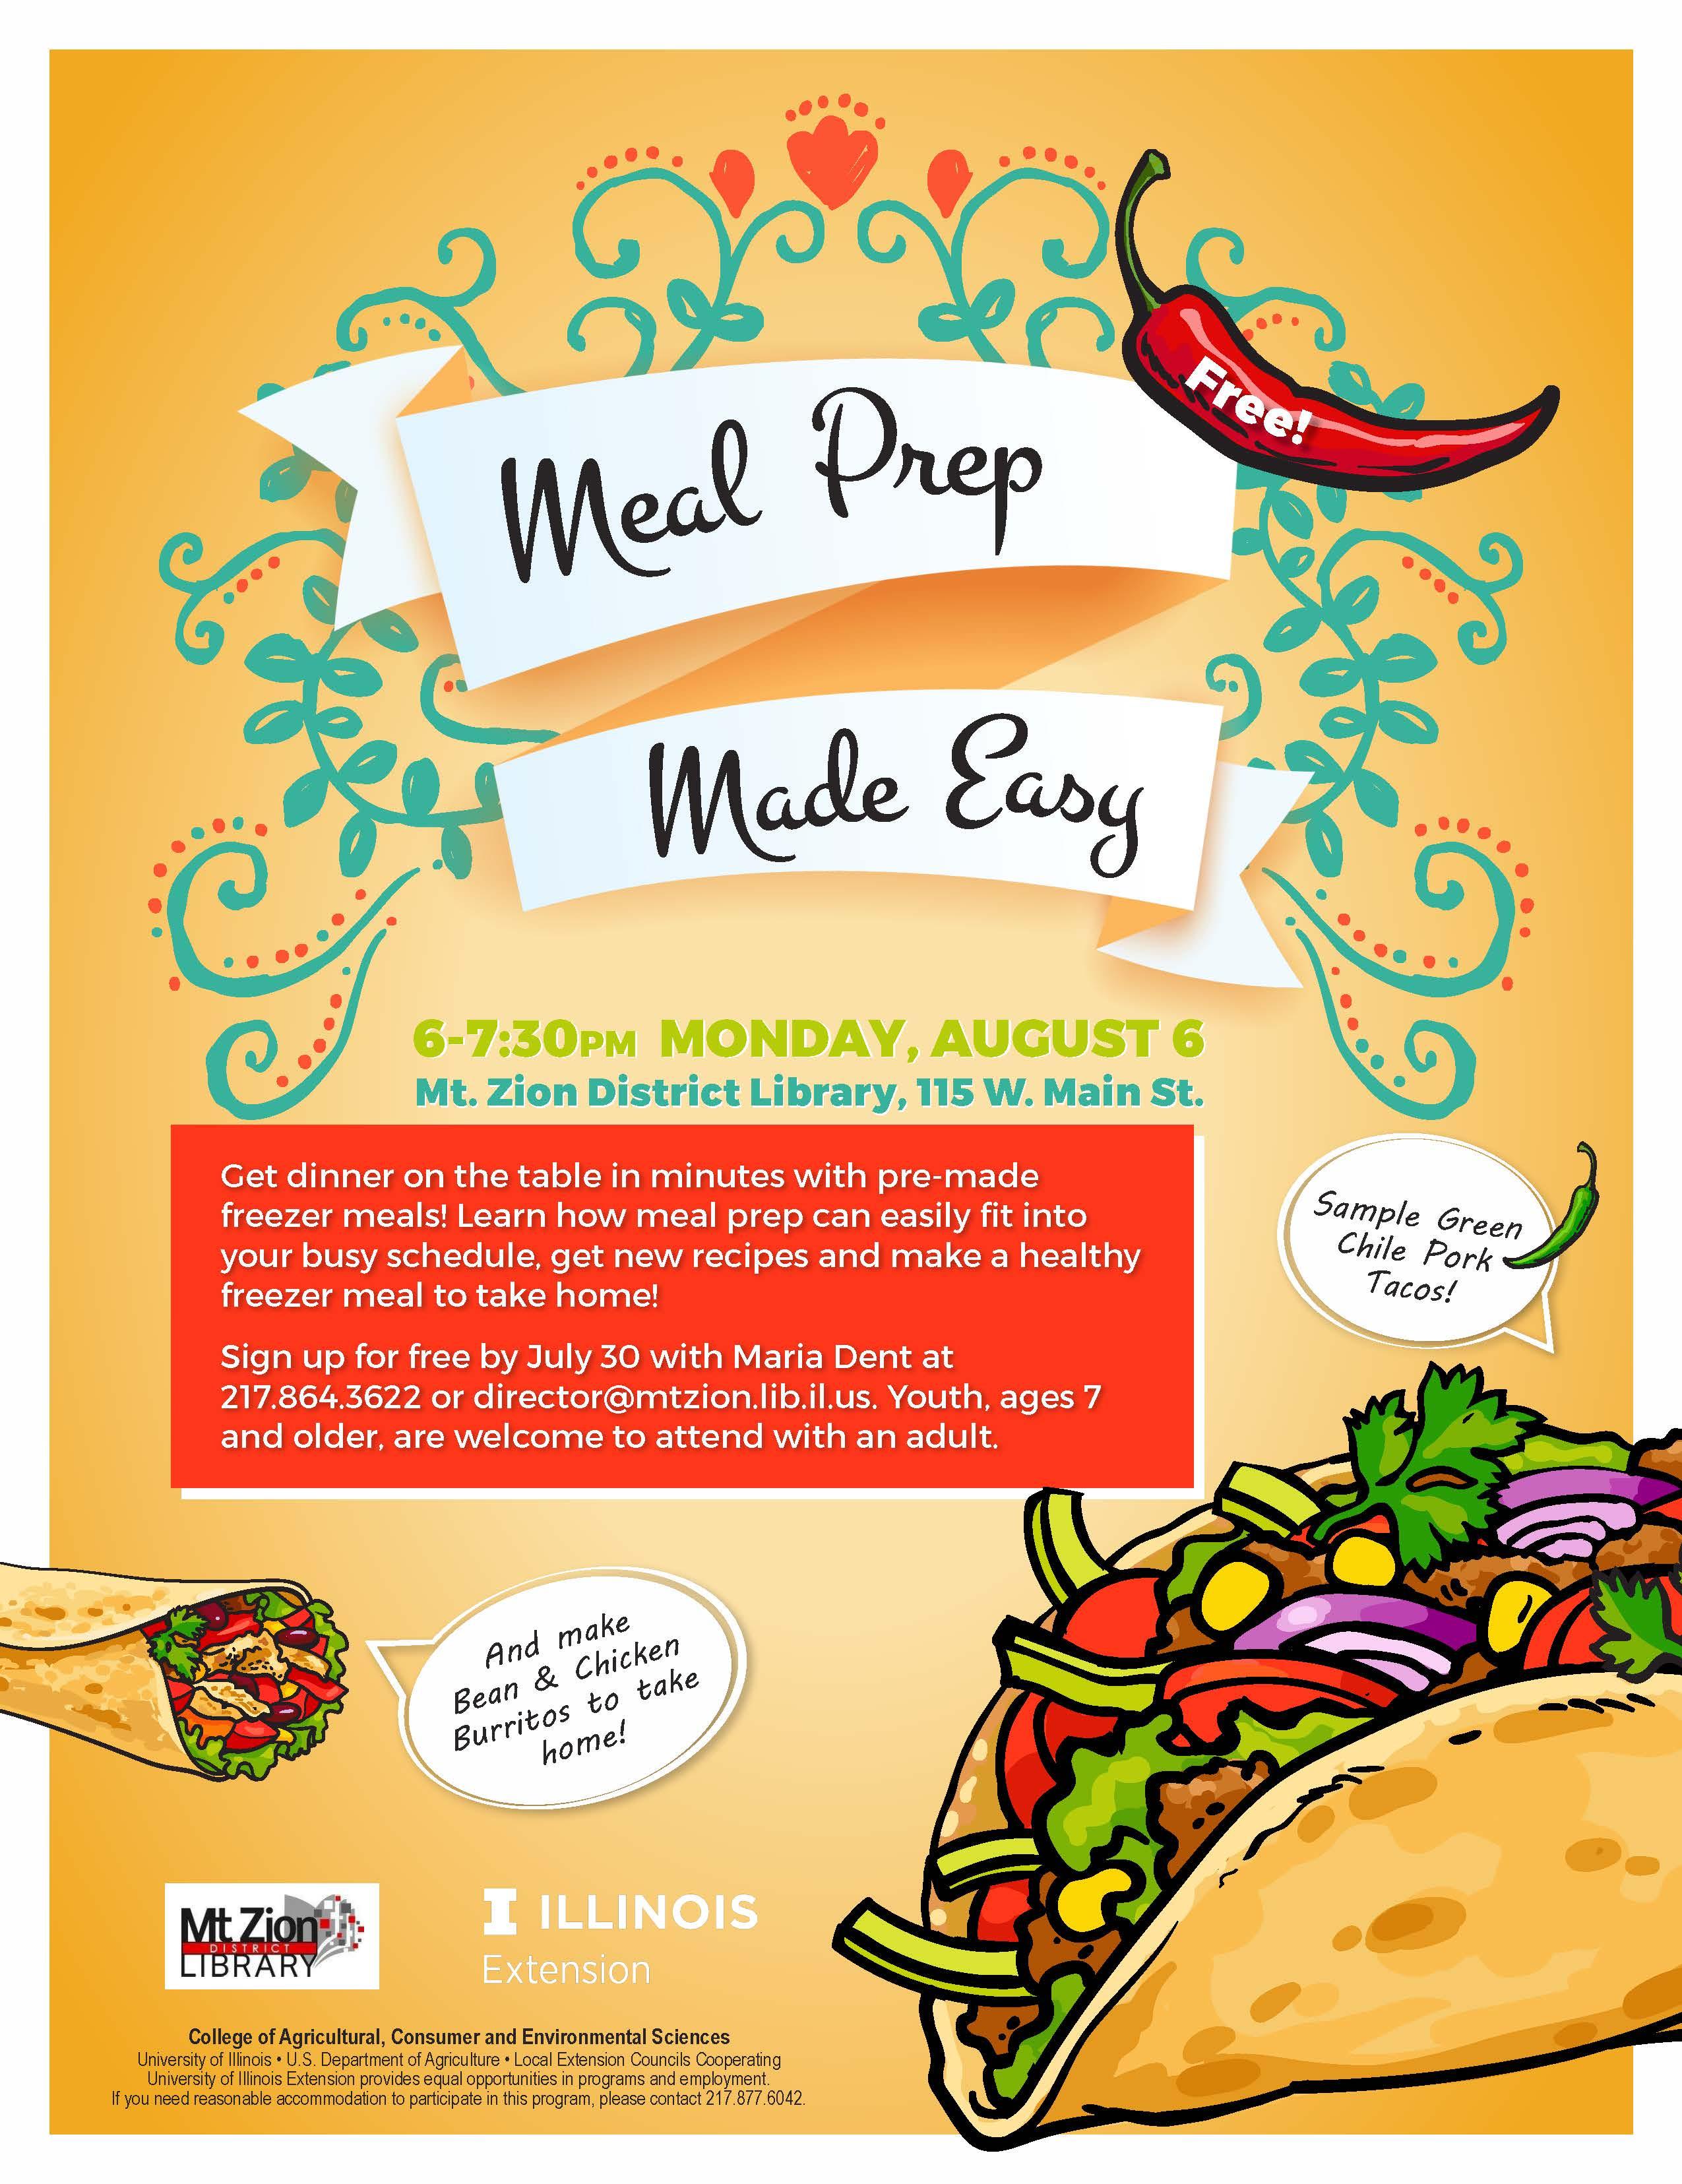 August 2018 Meal Prep Made Easy - Aug 2018 - Flyer (1).jpg